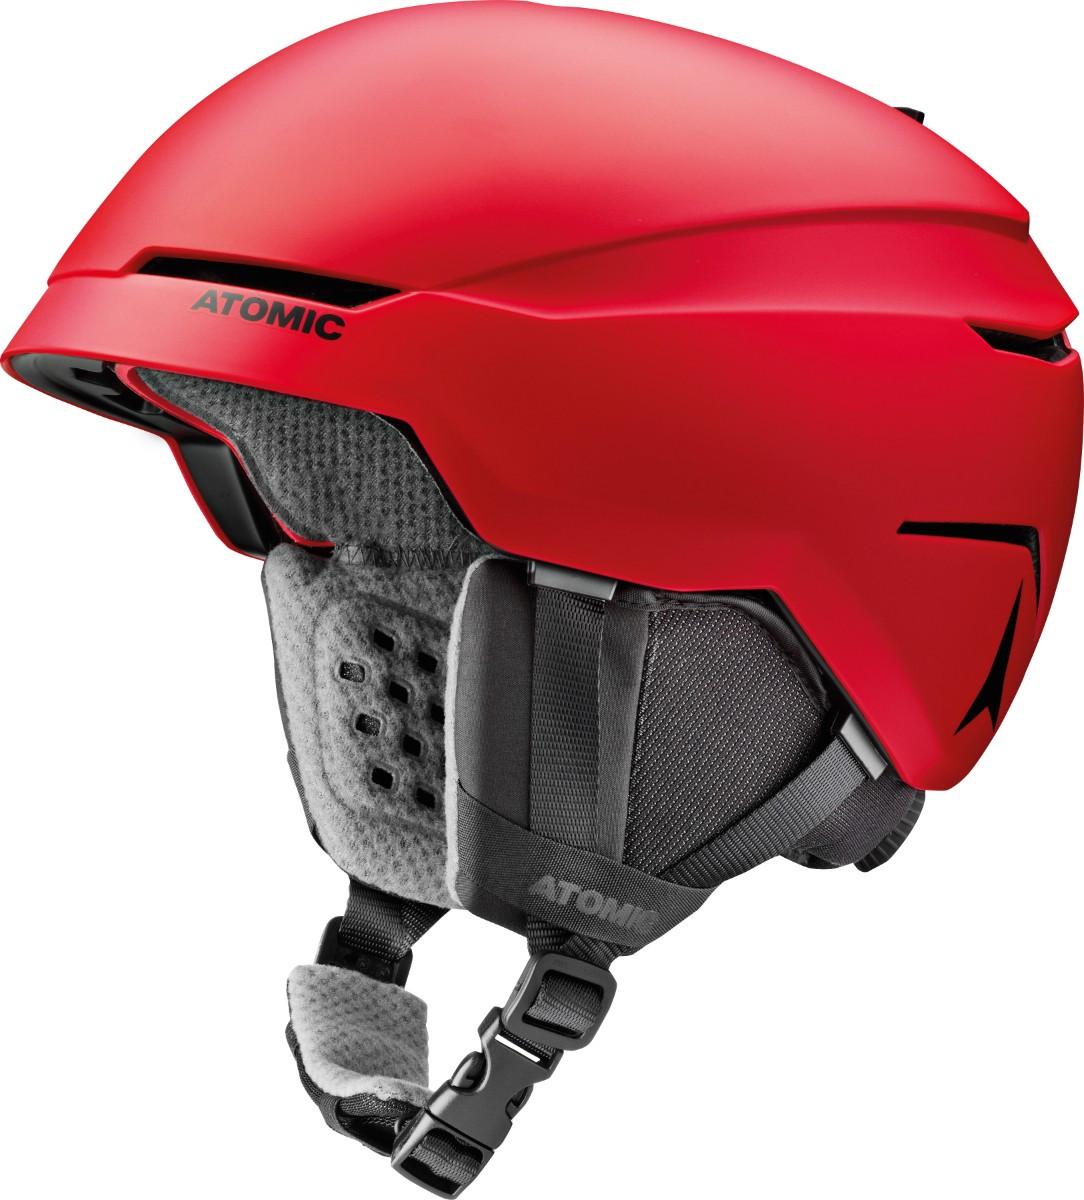 Atomic Savor - červená Velikost helmy: S 2019/2020